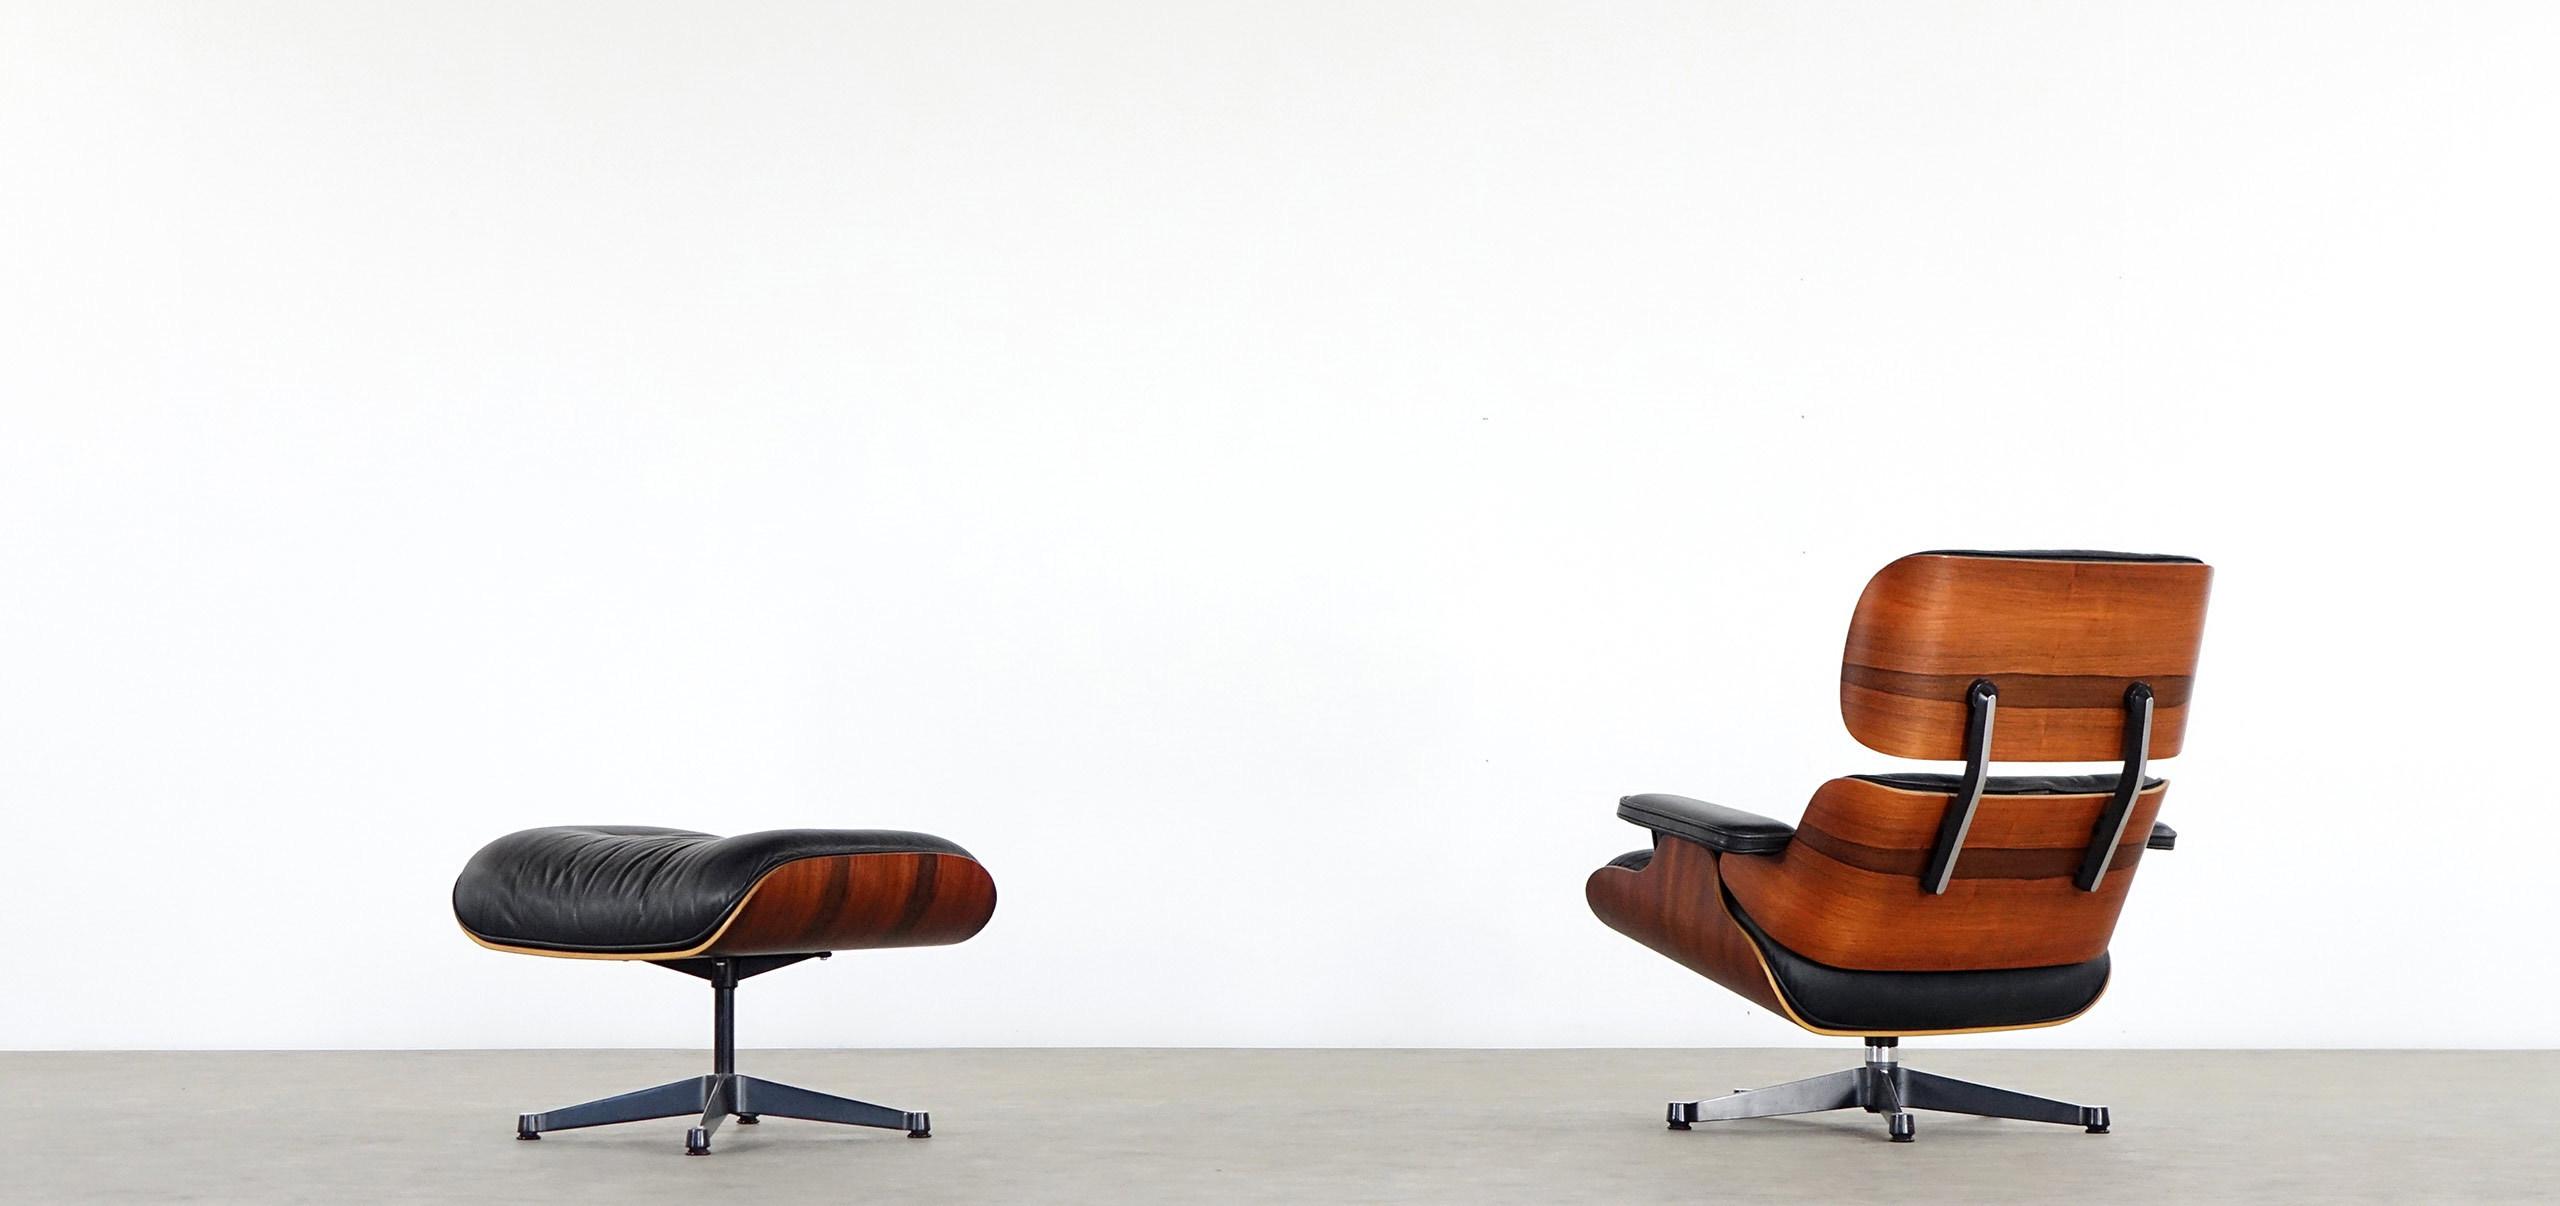 Charles eames lounge chair vitra herman miller zorrobot for Charles eames prix